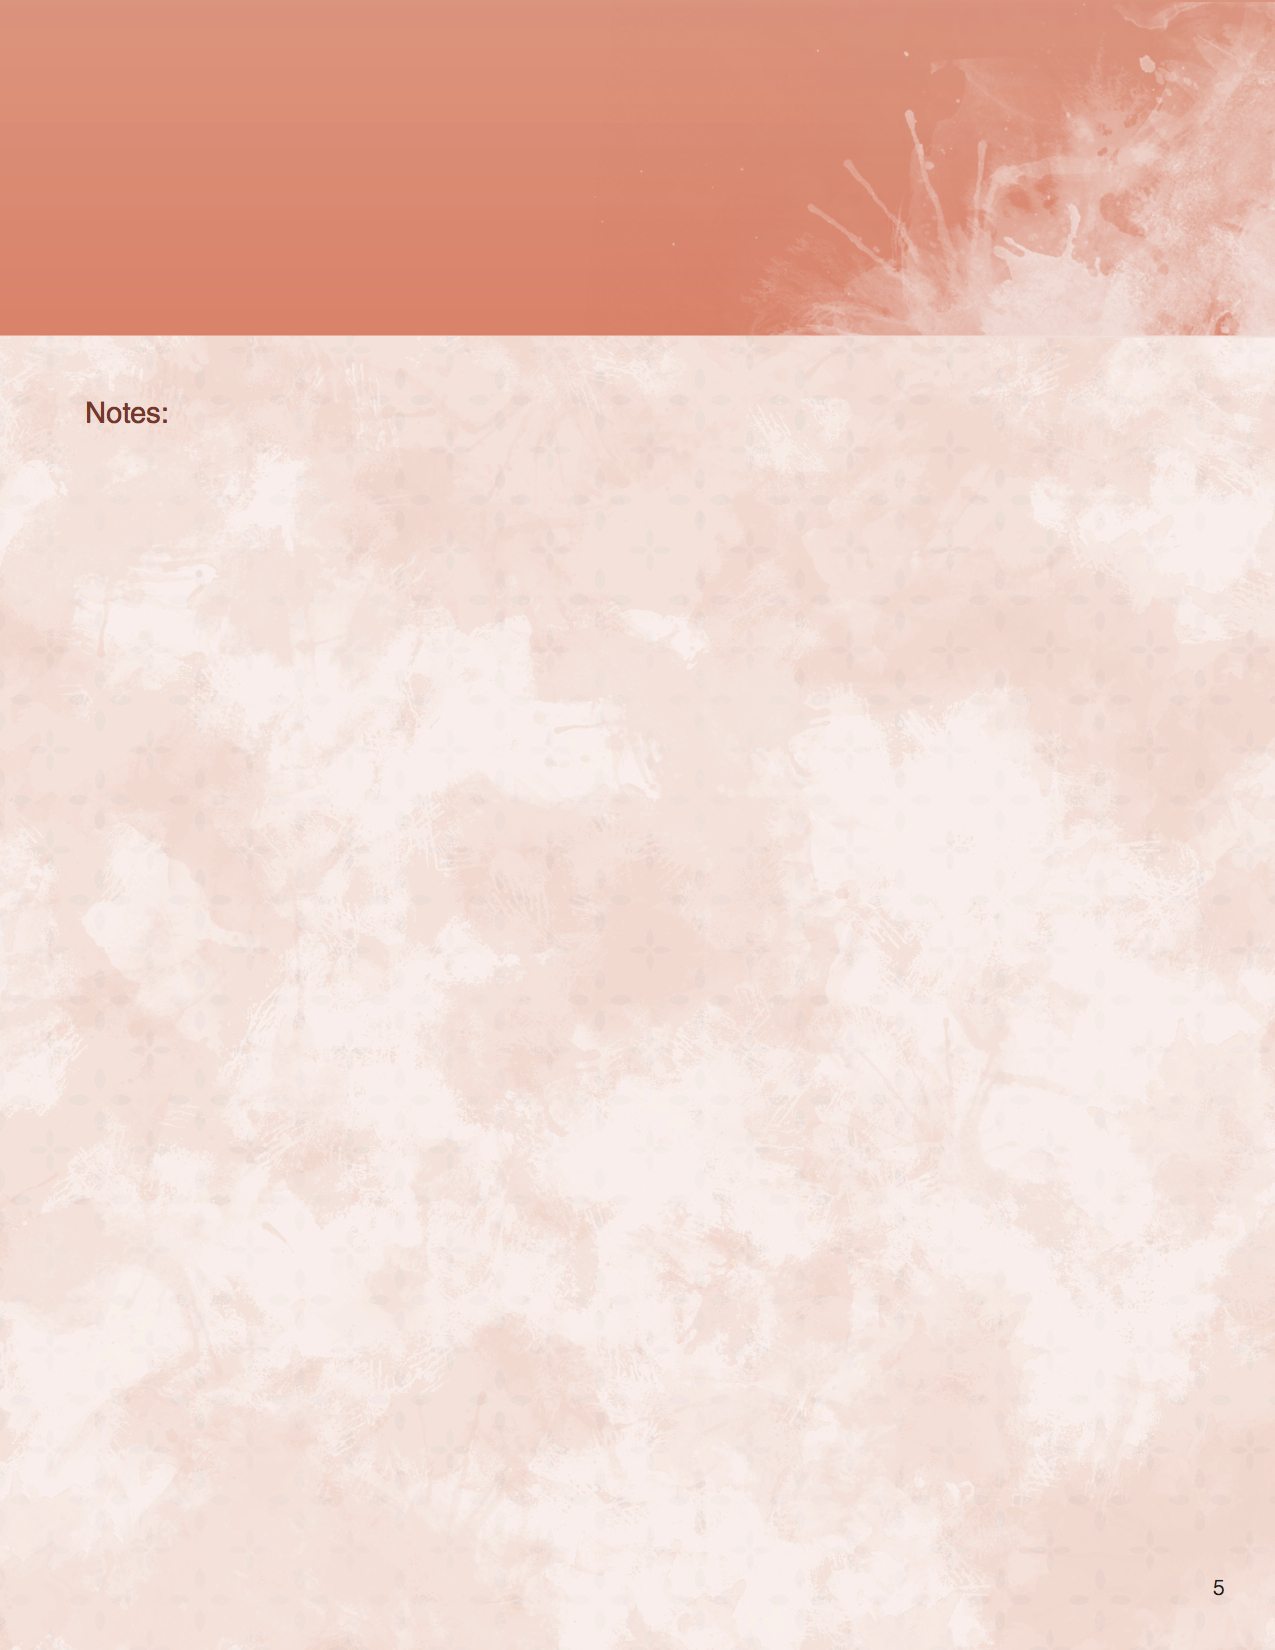 avanttot-print (2) (dragged) 7.jpeg